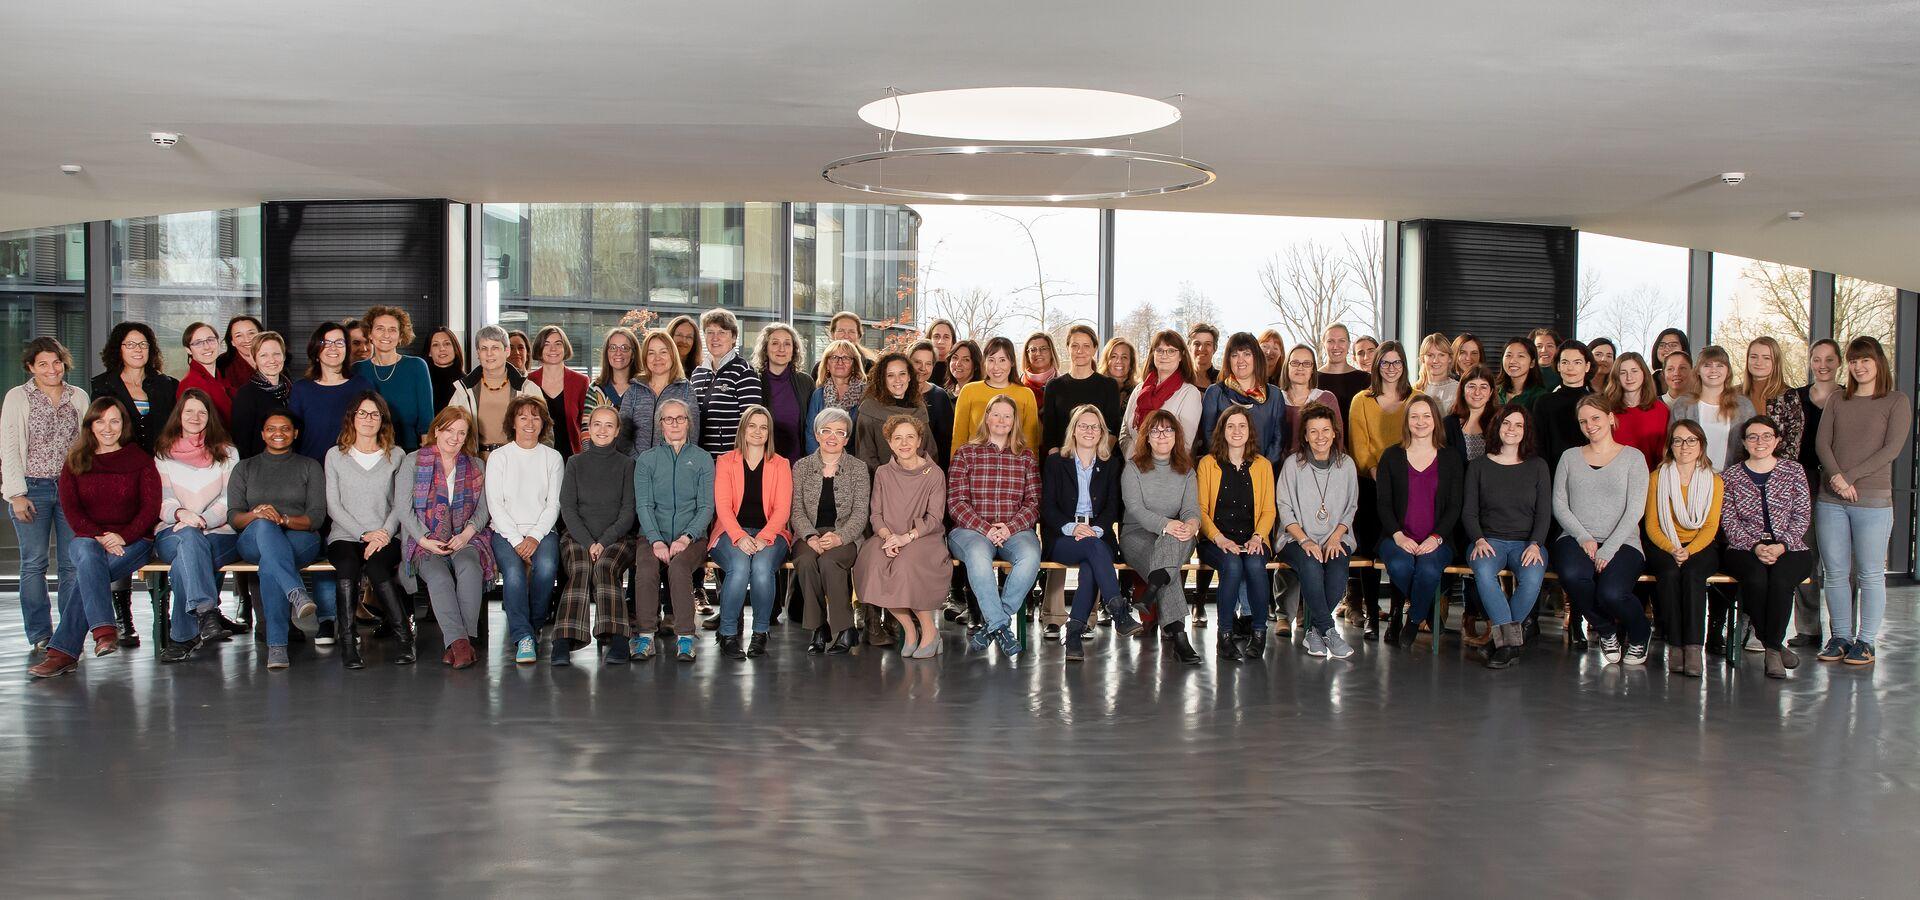 Celebrating women at ESO — part II